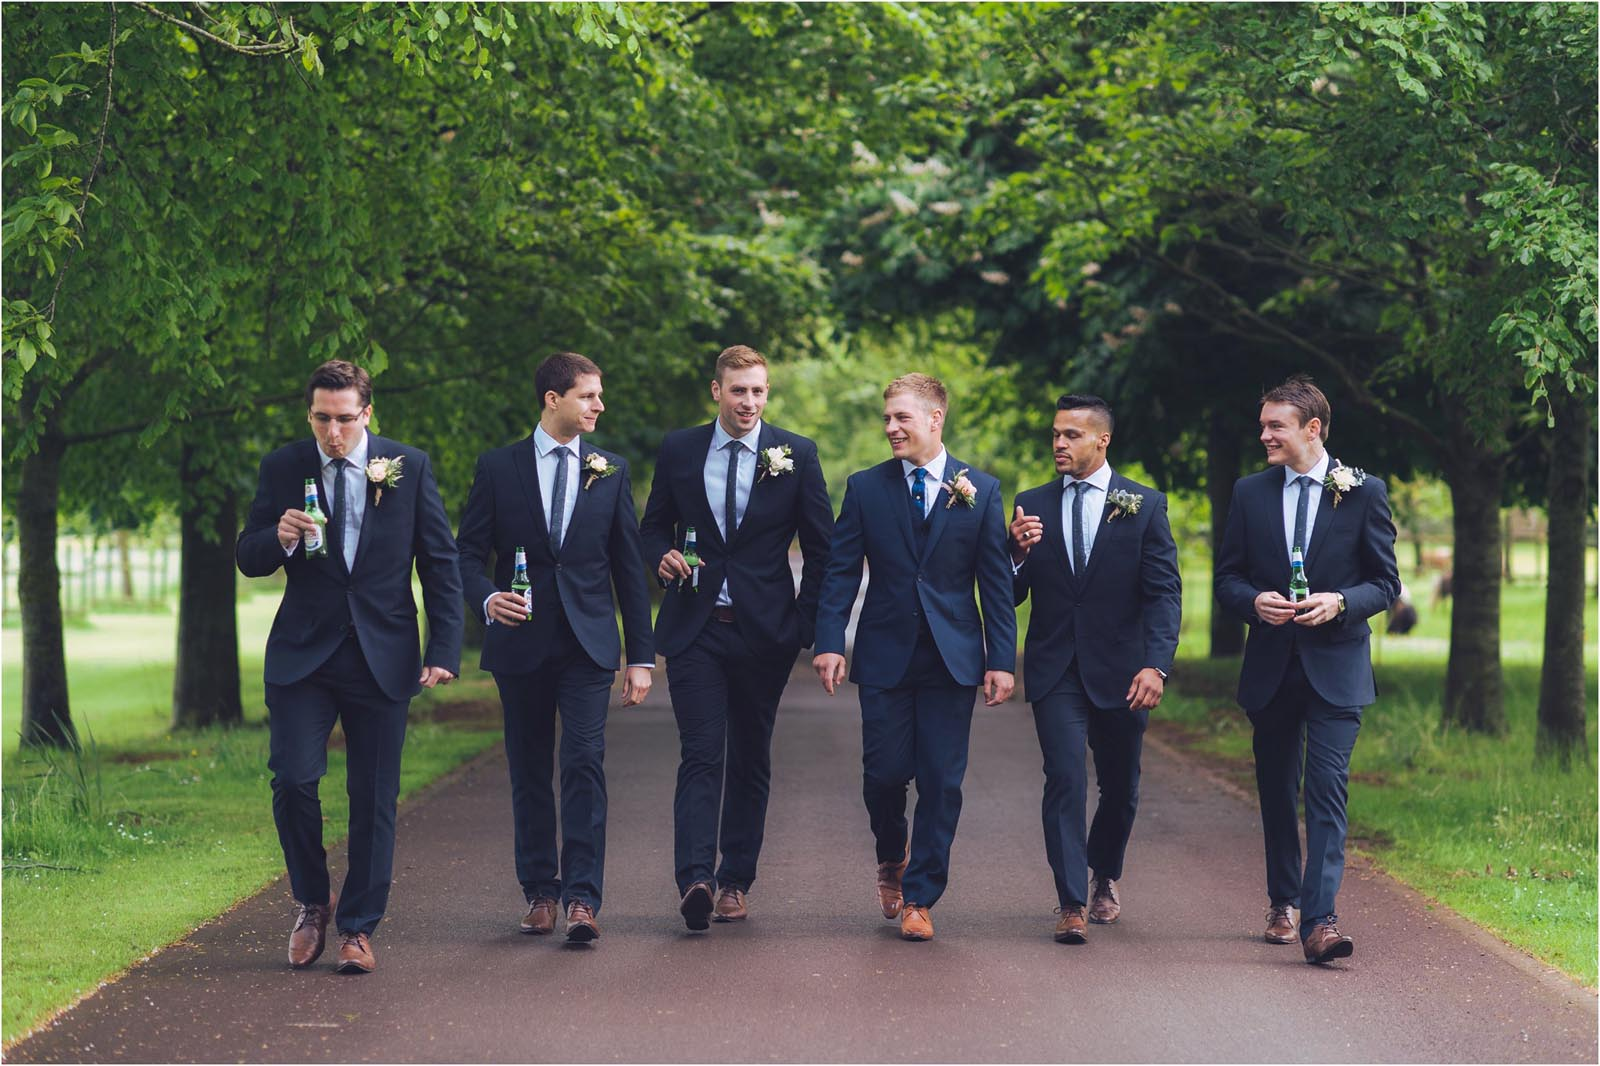 Simon biffen wedding photography 0047